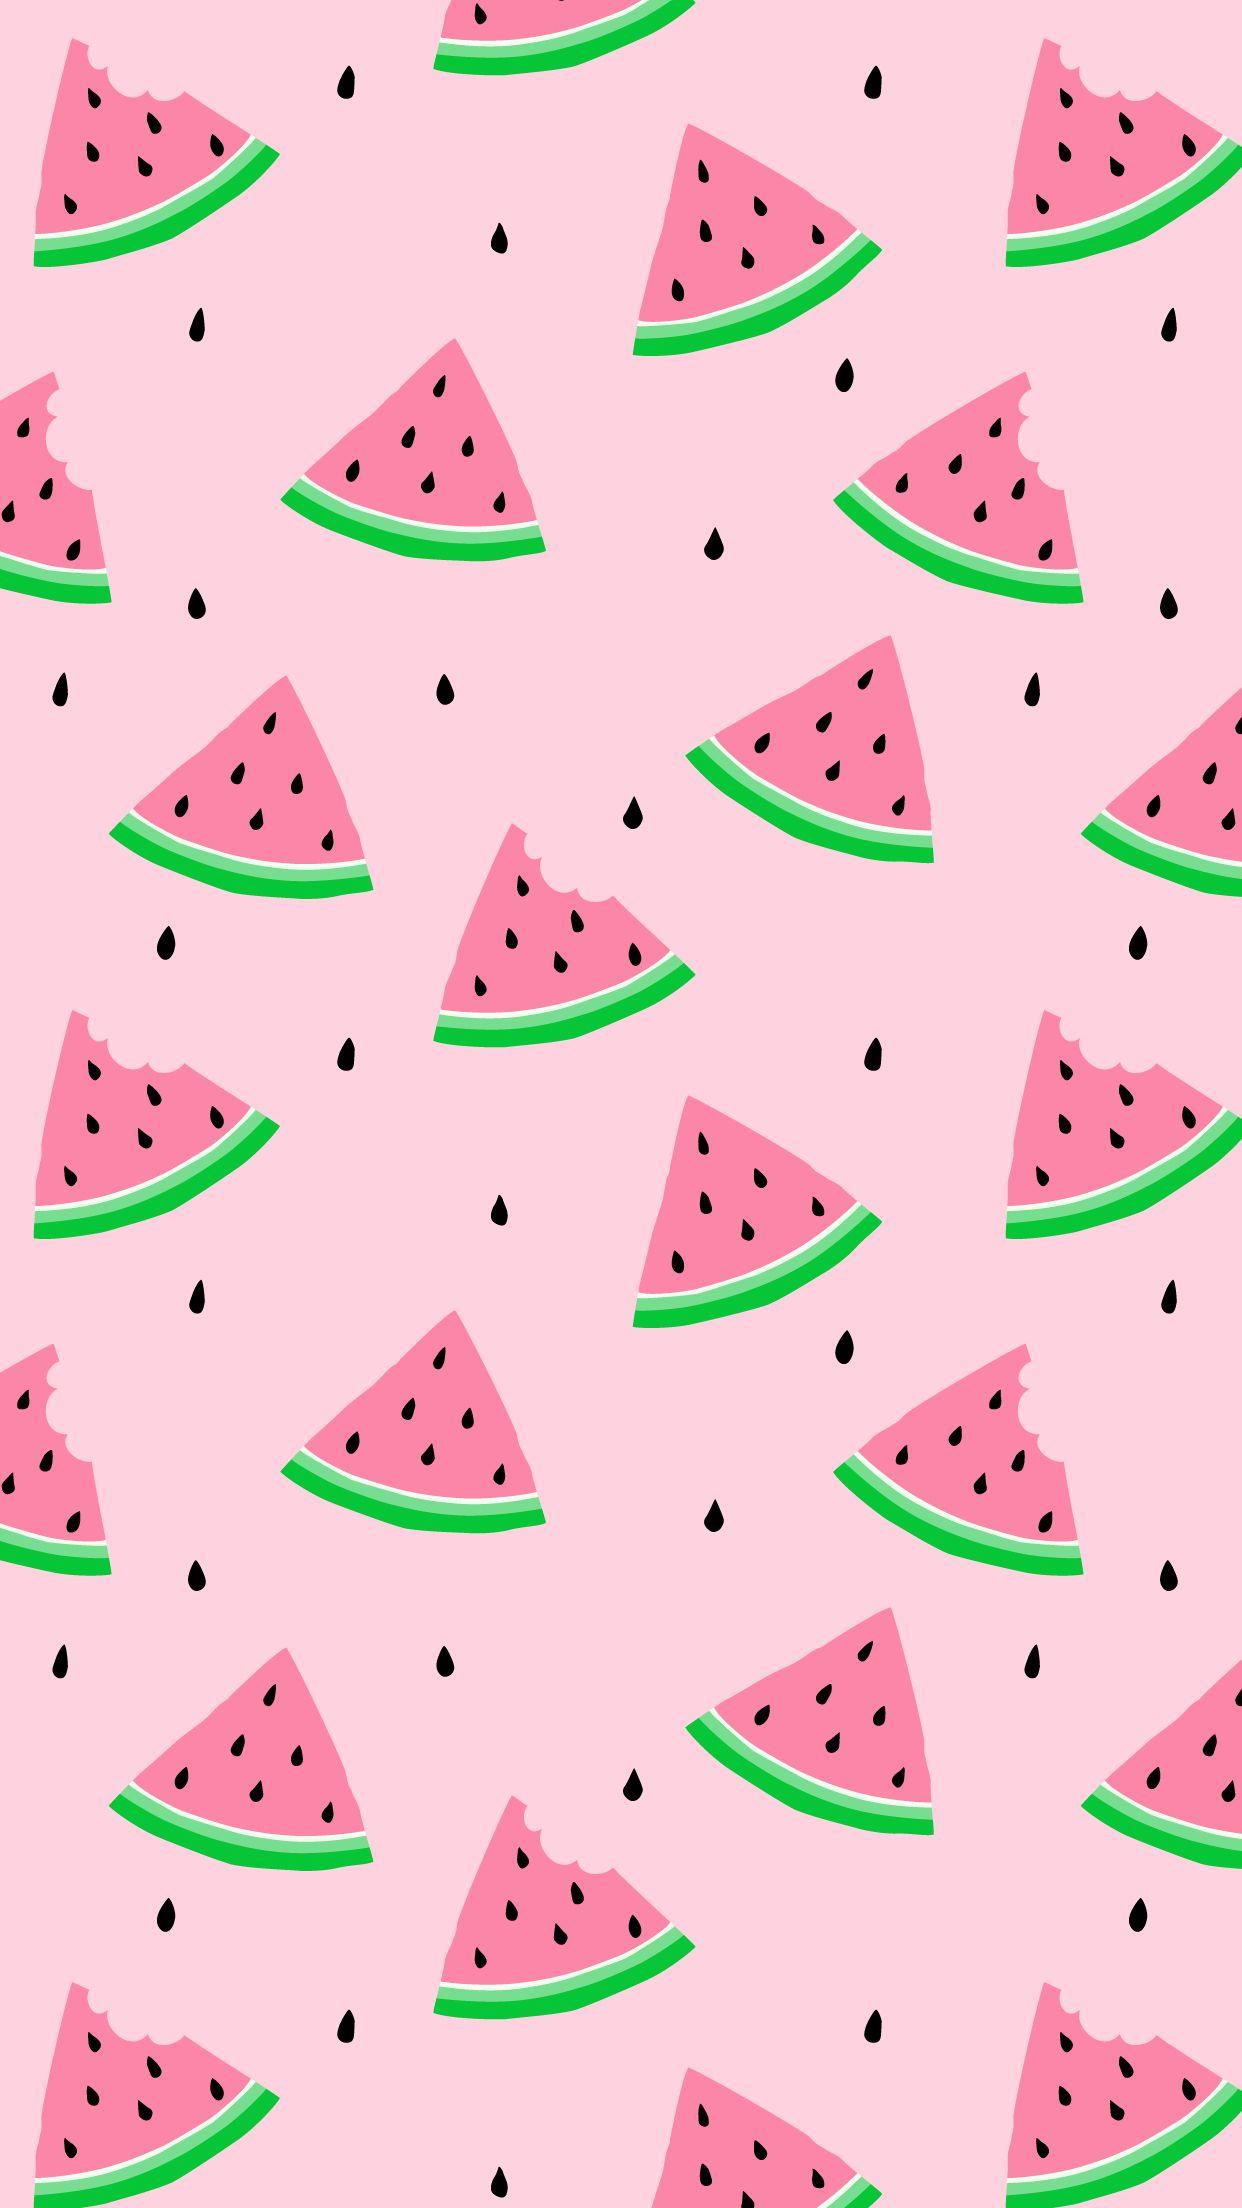 Watermelon wallpaper Watermelon wallpaper, Cute